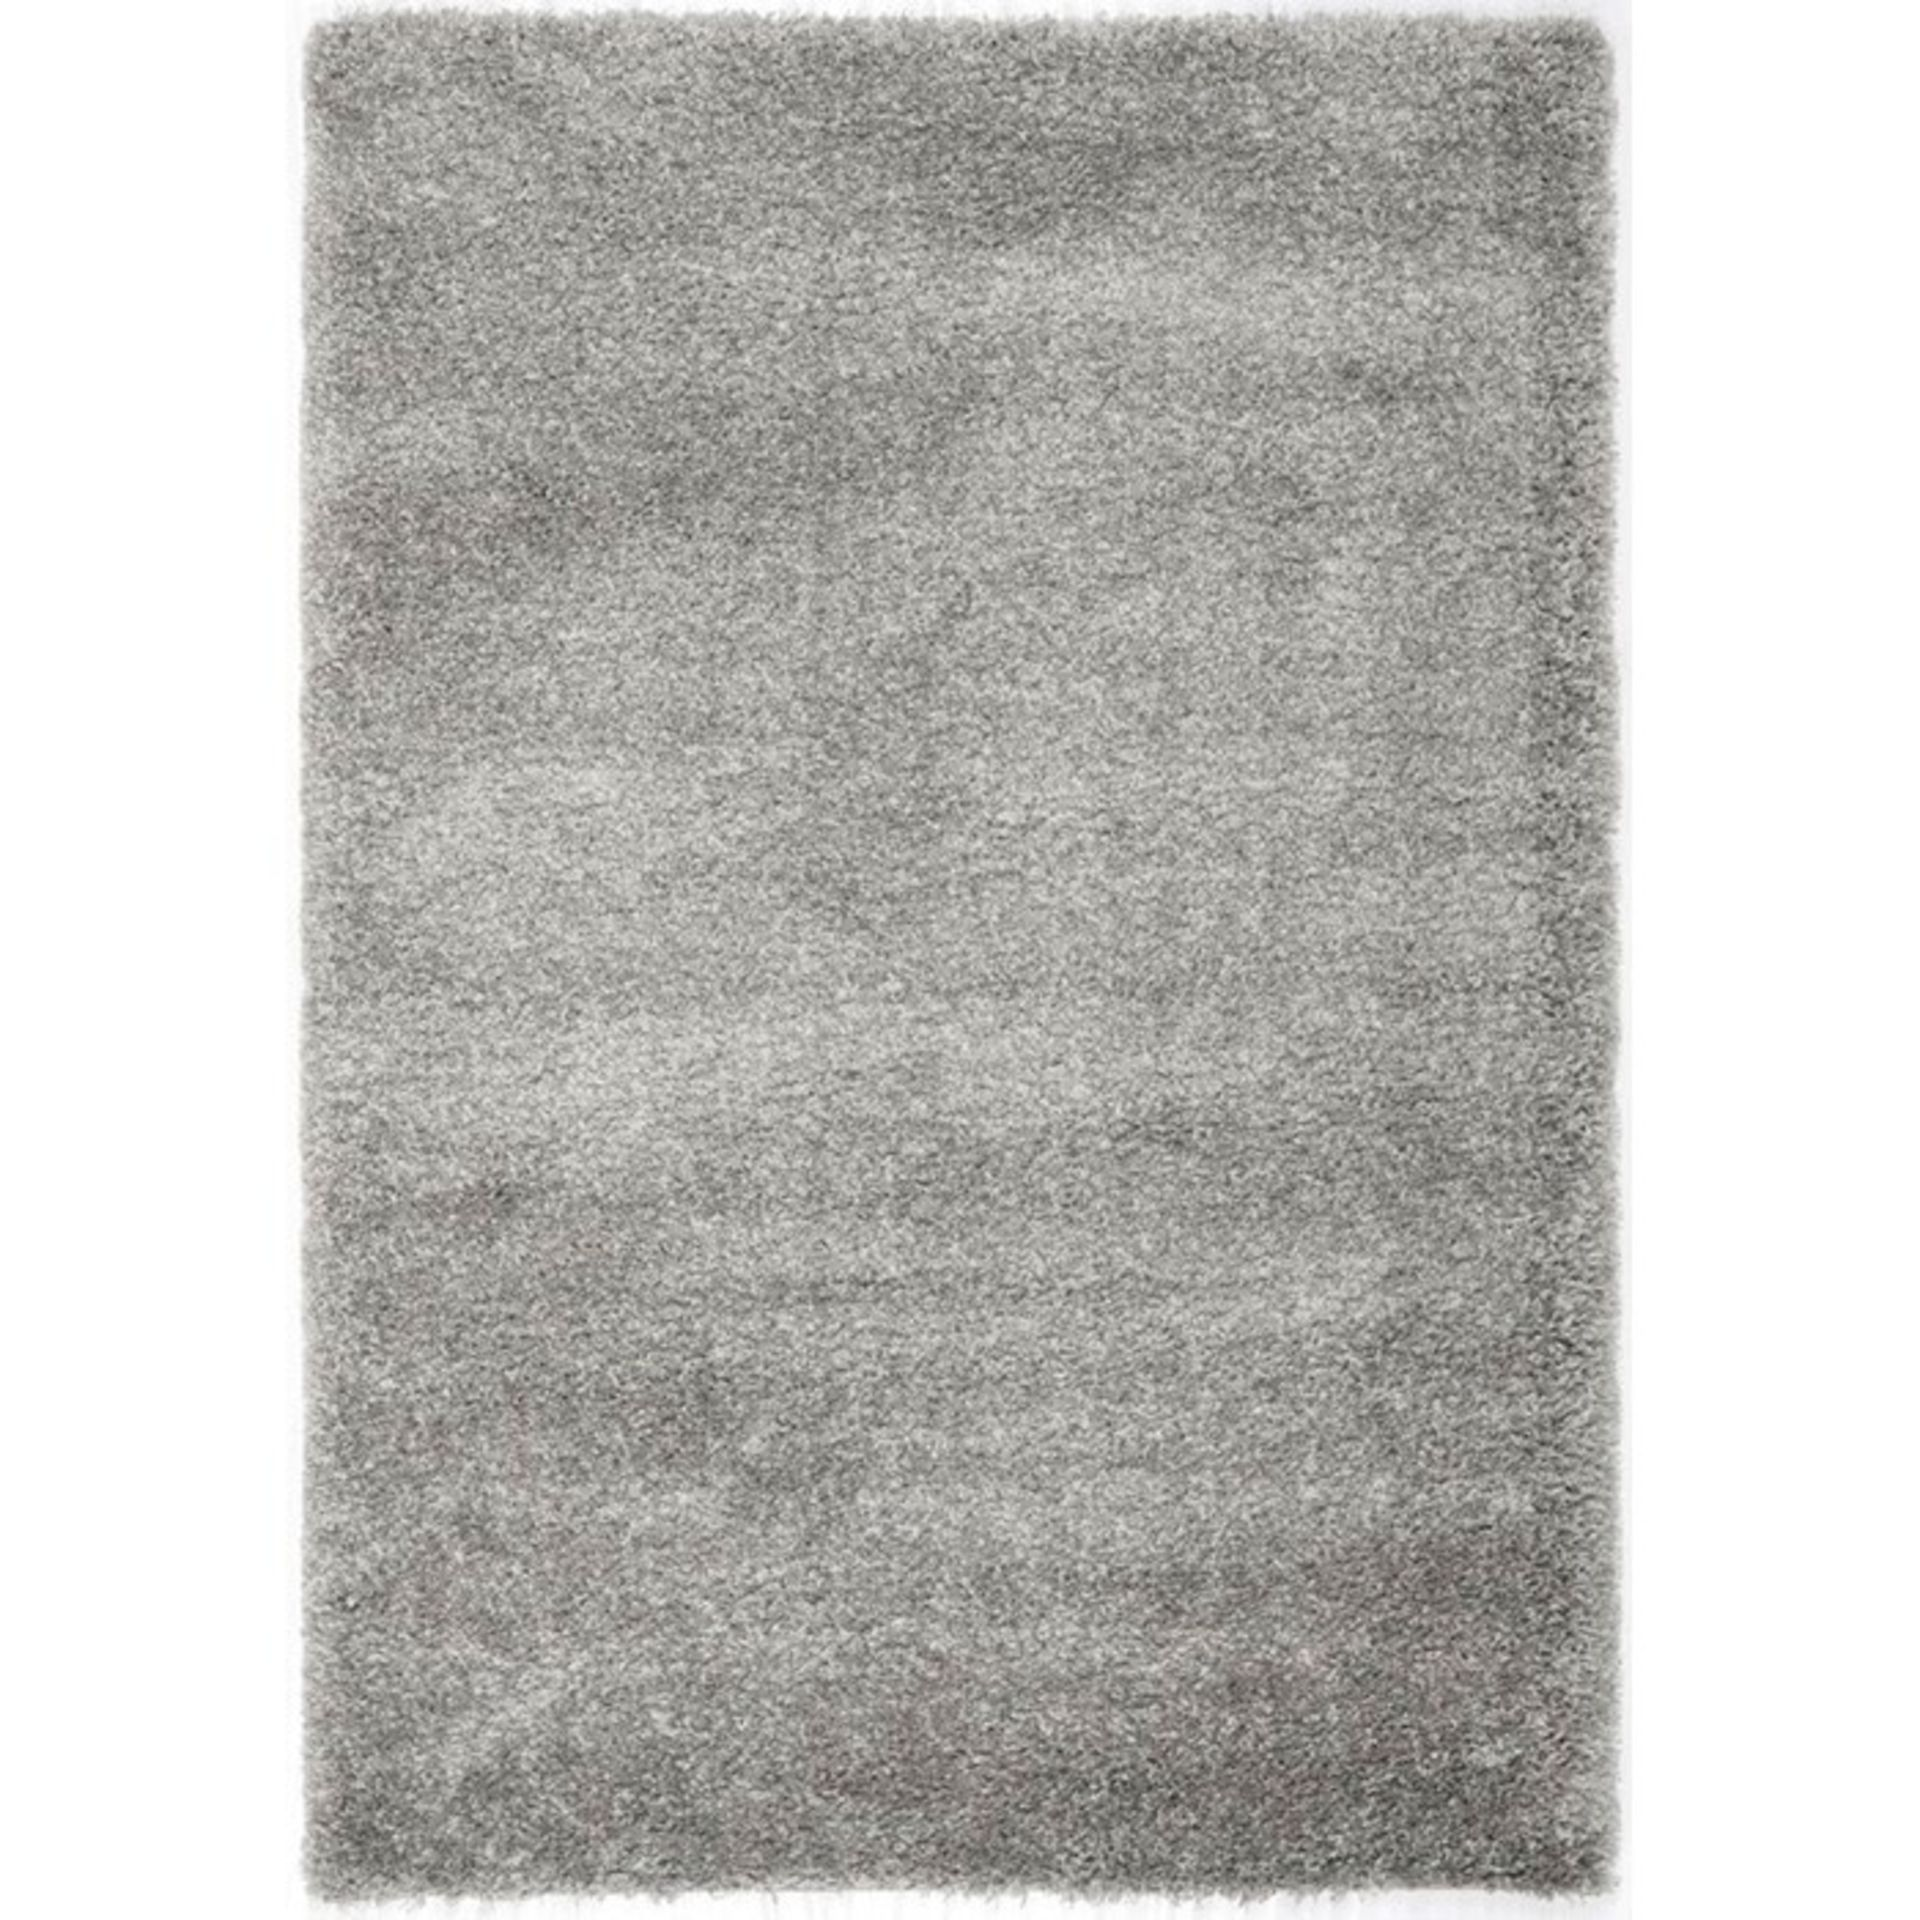 Saltash Grey Area Rug Rug Size: Round 200cm (HL7 - 3/6 -SFVH3536.9057497)